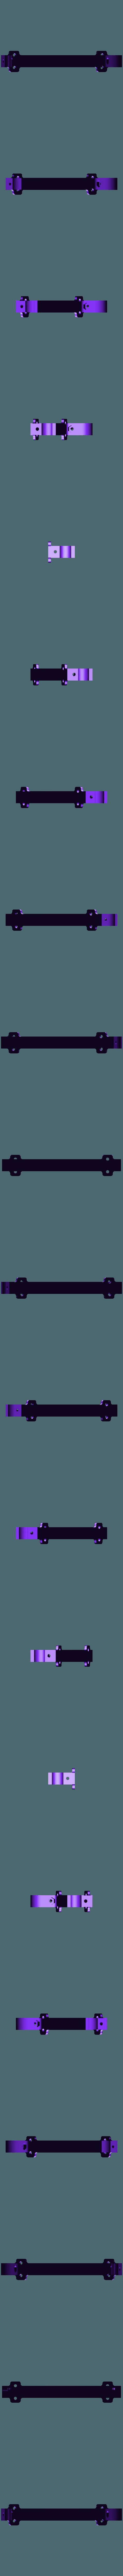 timing_belt_mounting__part1A.stl Download free STL file FDM Printer de Kleine Reus 300x300x900 • 3D printable object, Job